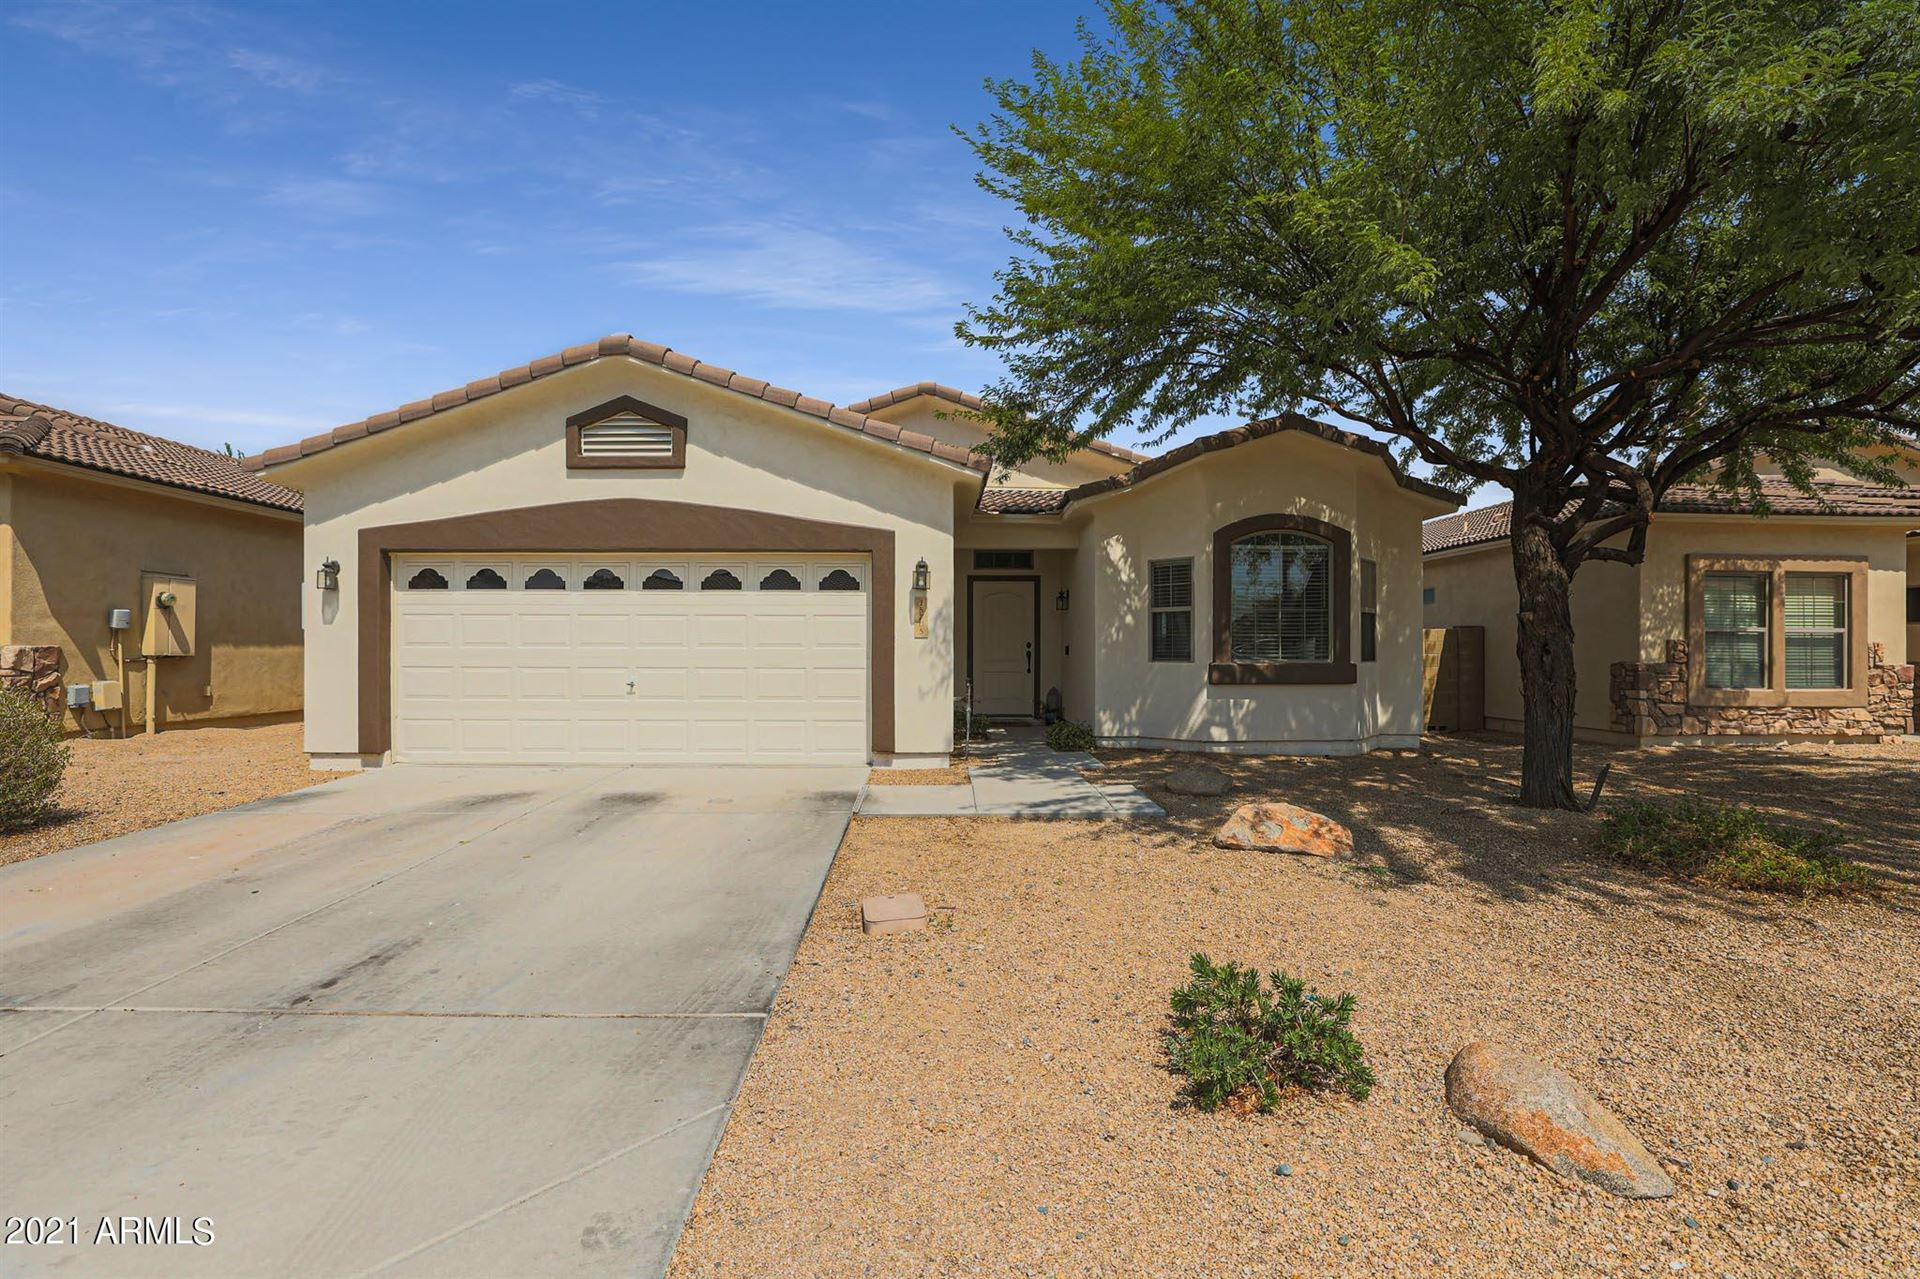 Photo of 15705 N POPPY Street, El Mirage, AZ 85335 (MLS # 6269179)